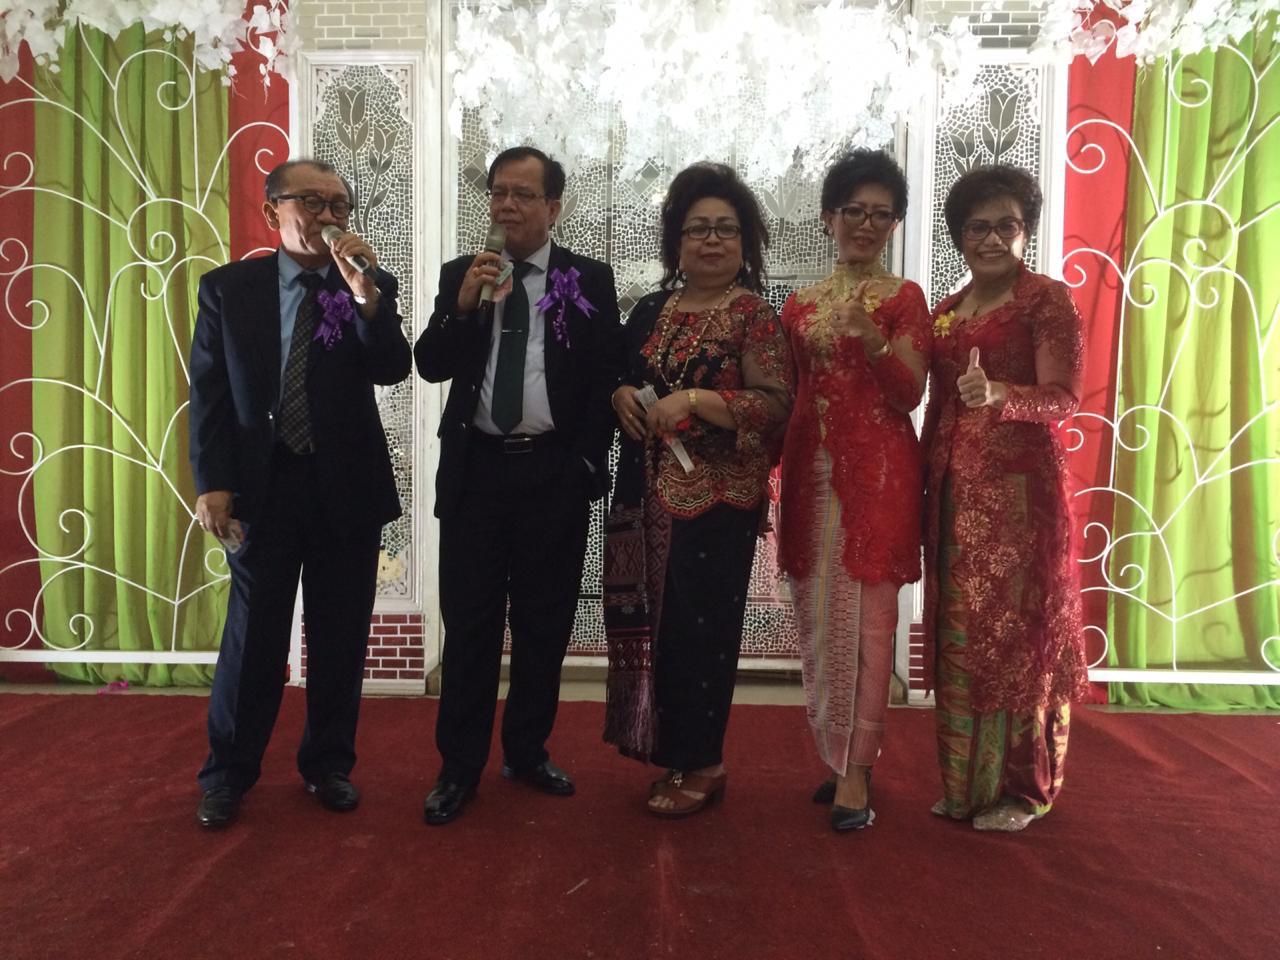 Perayaan Natal PARNASIB Kota Madya Medan Dan Kabupaten Deli Serdang 2019 Berlangsung  Meriah Dan Penuh Sukacita